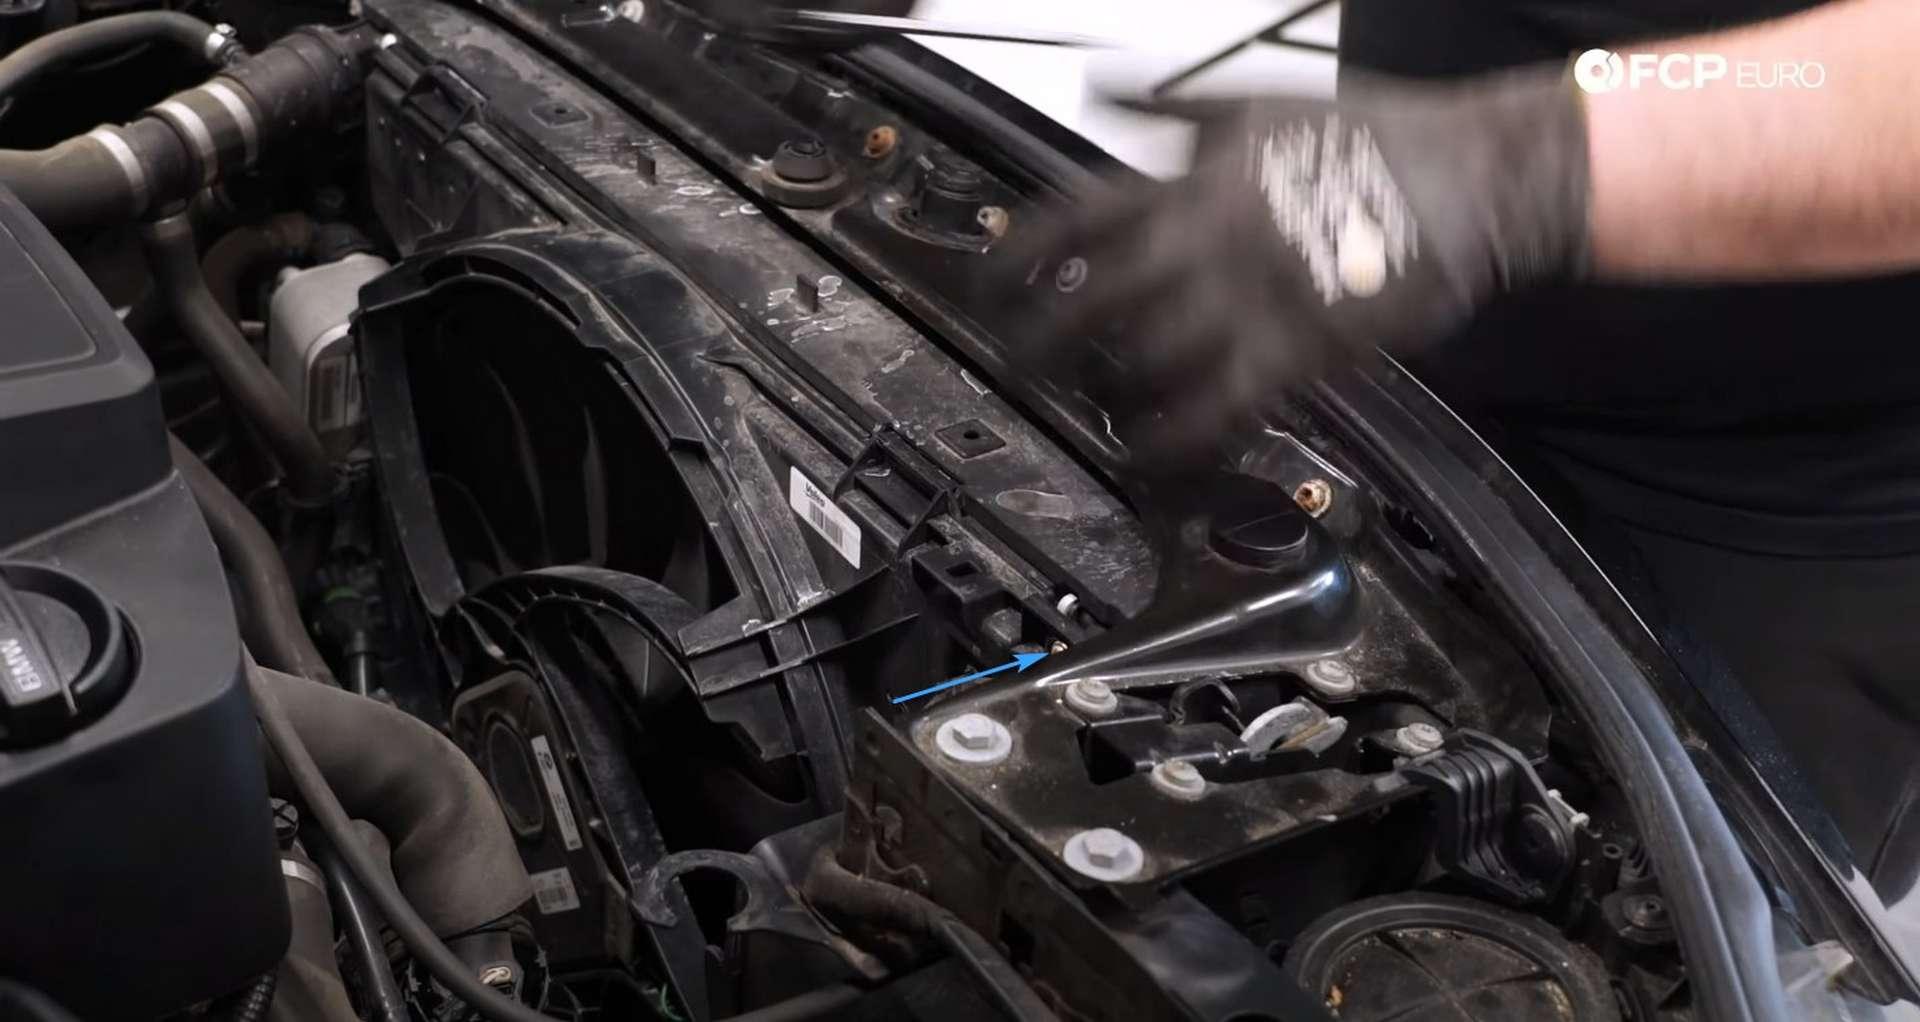 DIY BMW F30 Radiator Replacement loosening removing the transmission oil cooler fastener